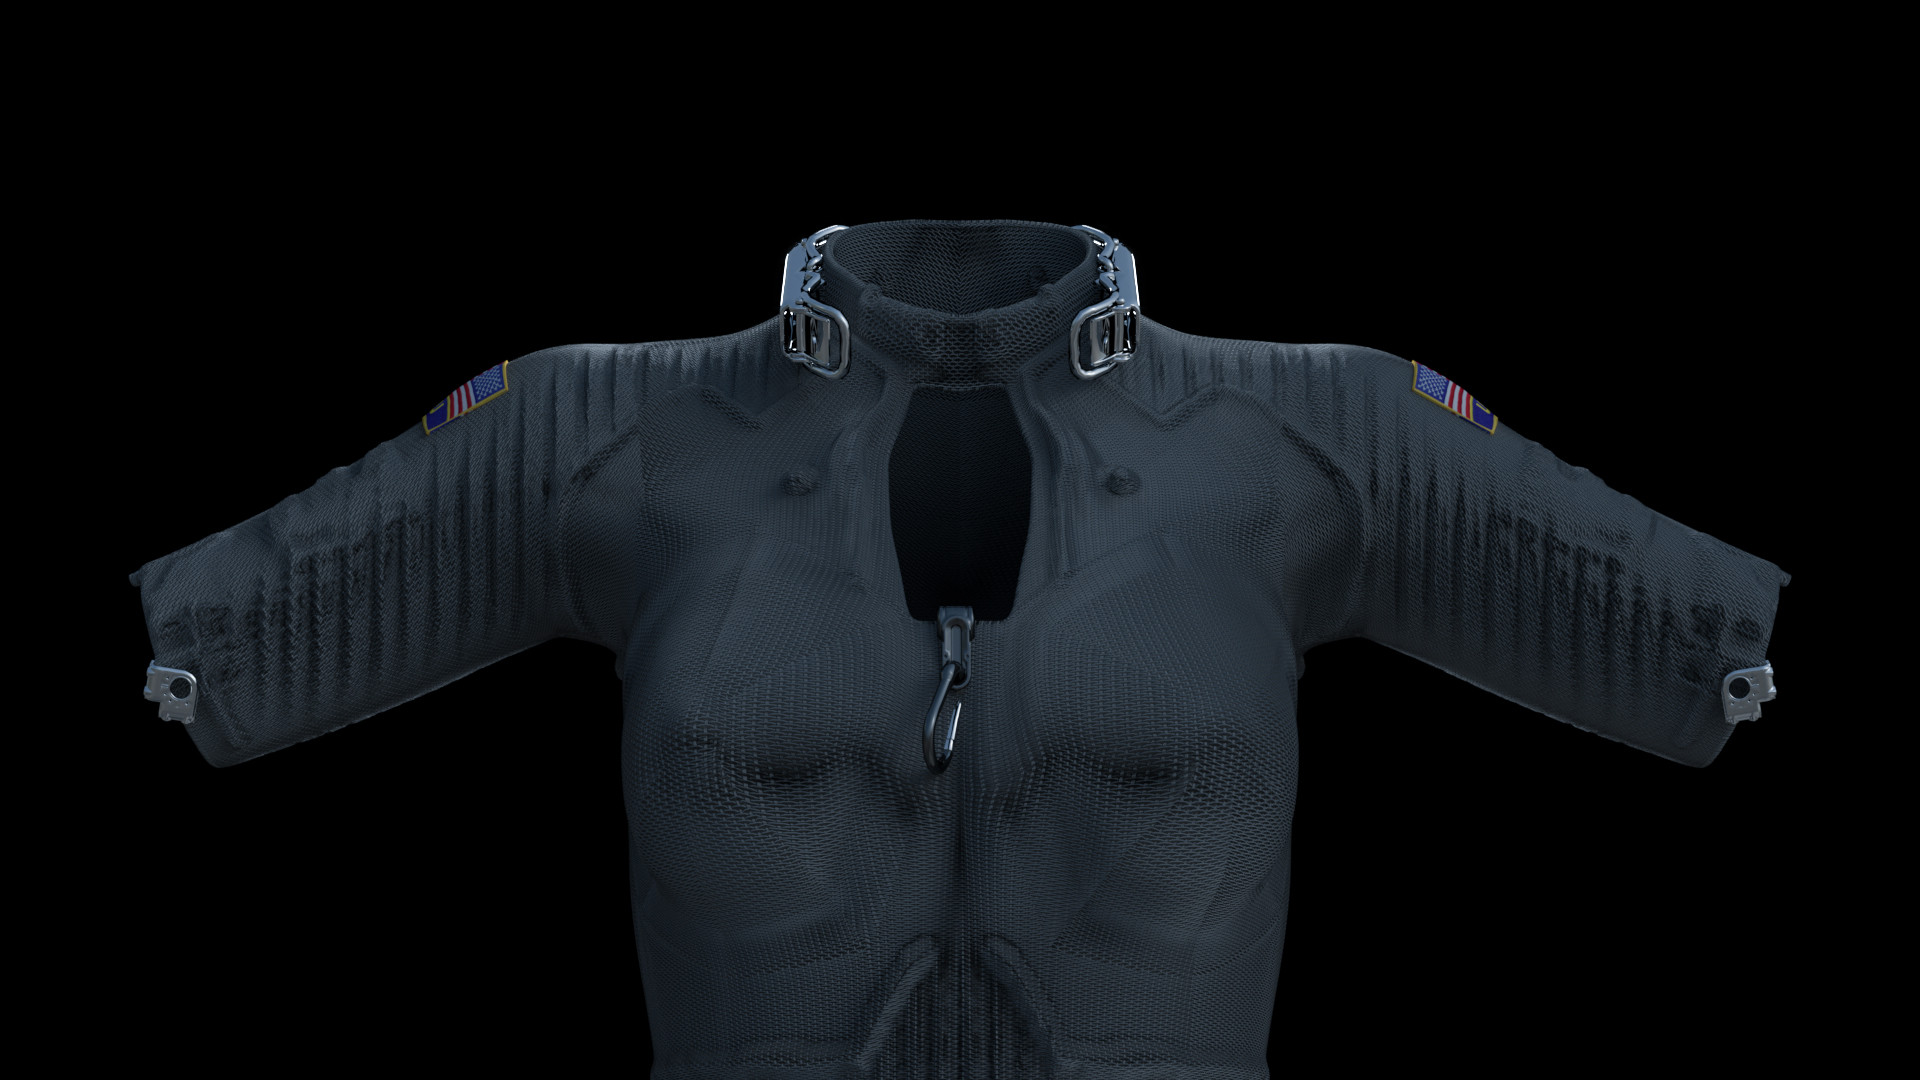 Michelangelo girardi scifi uniform front